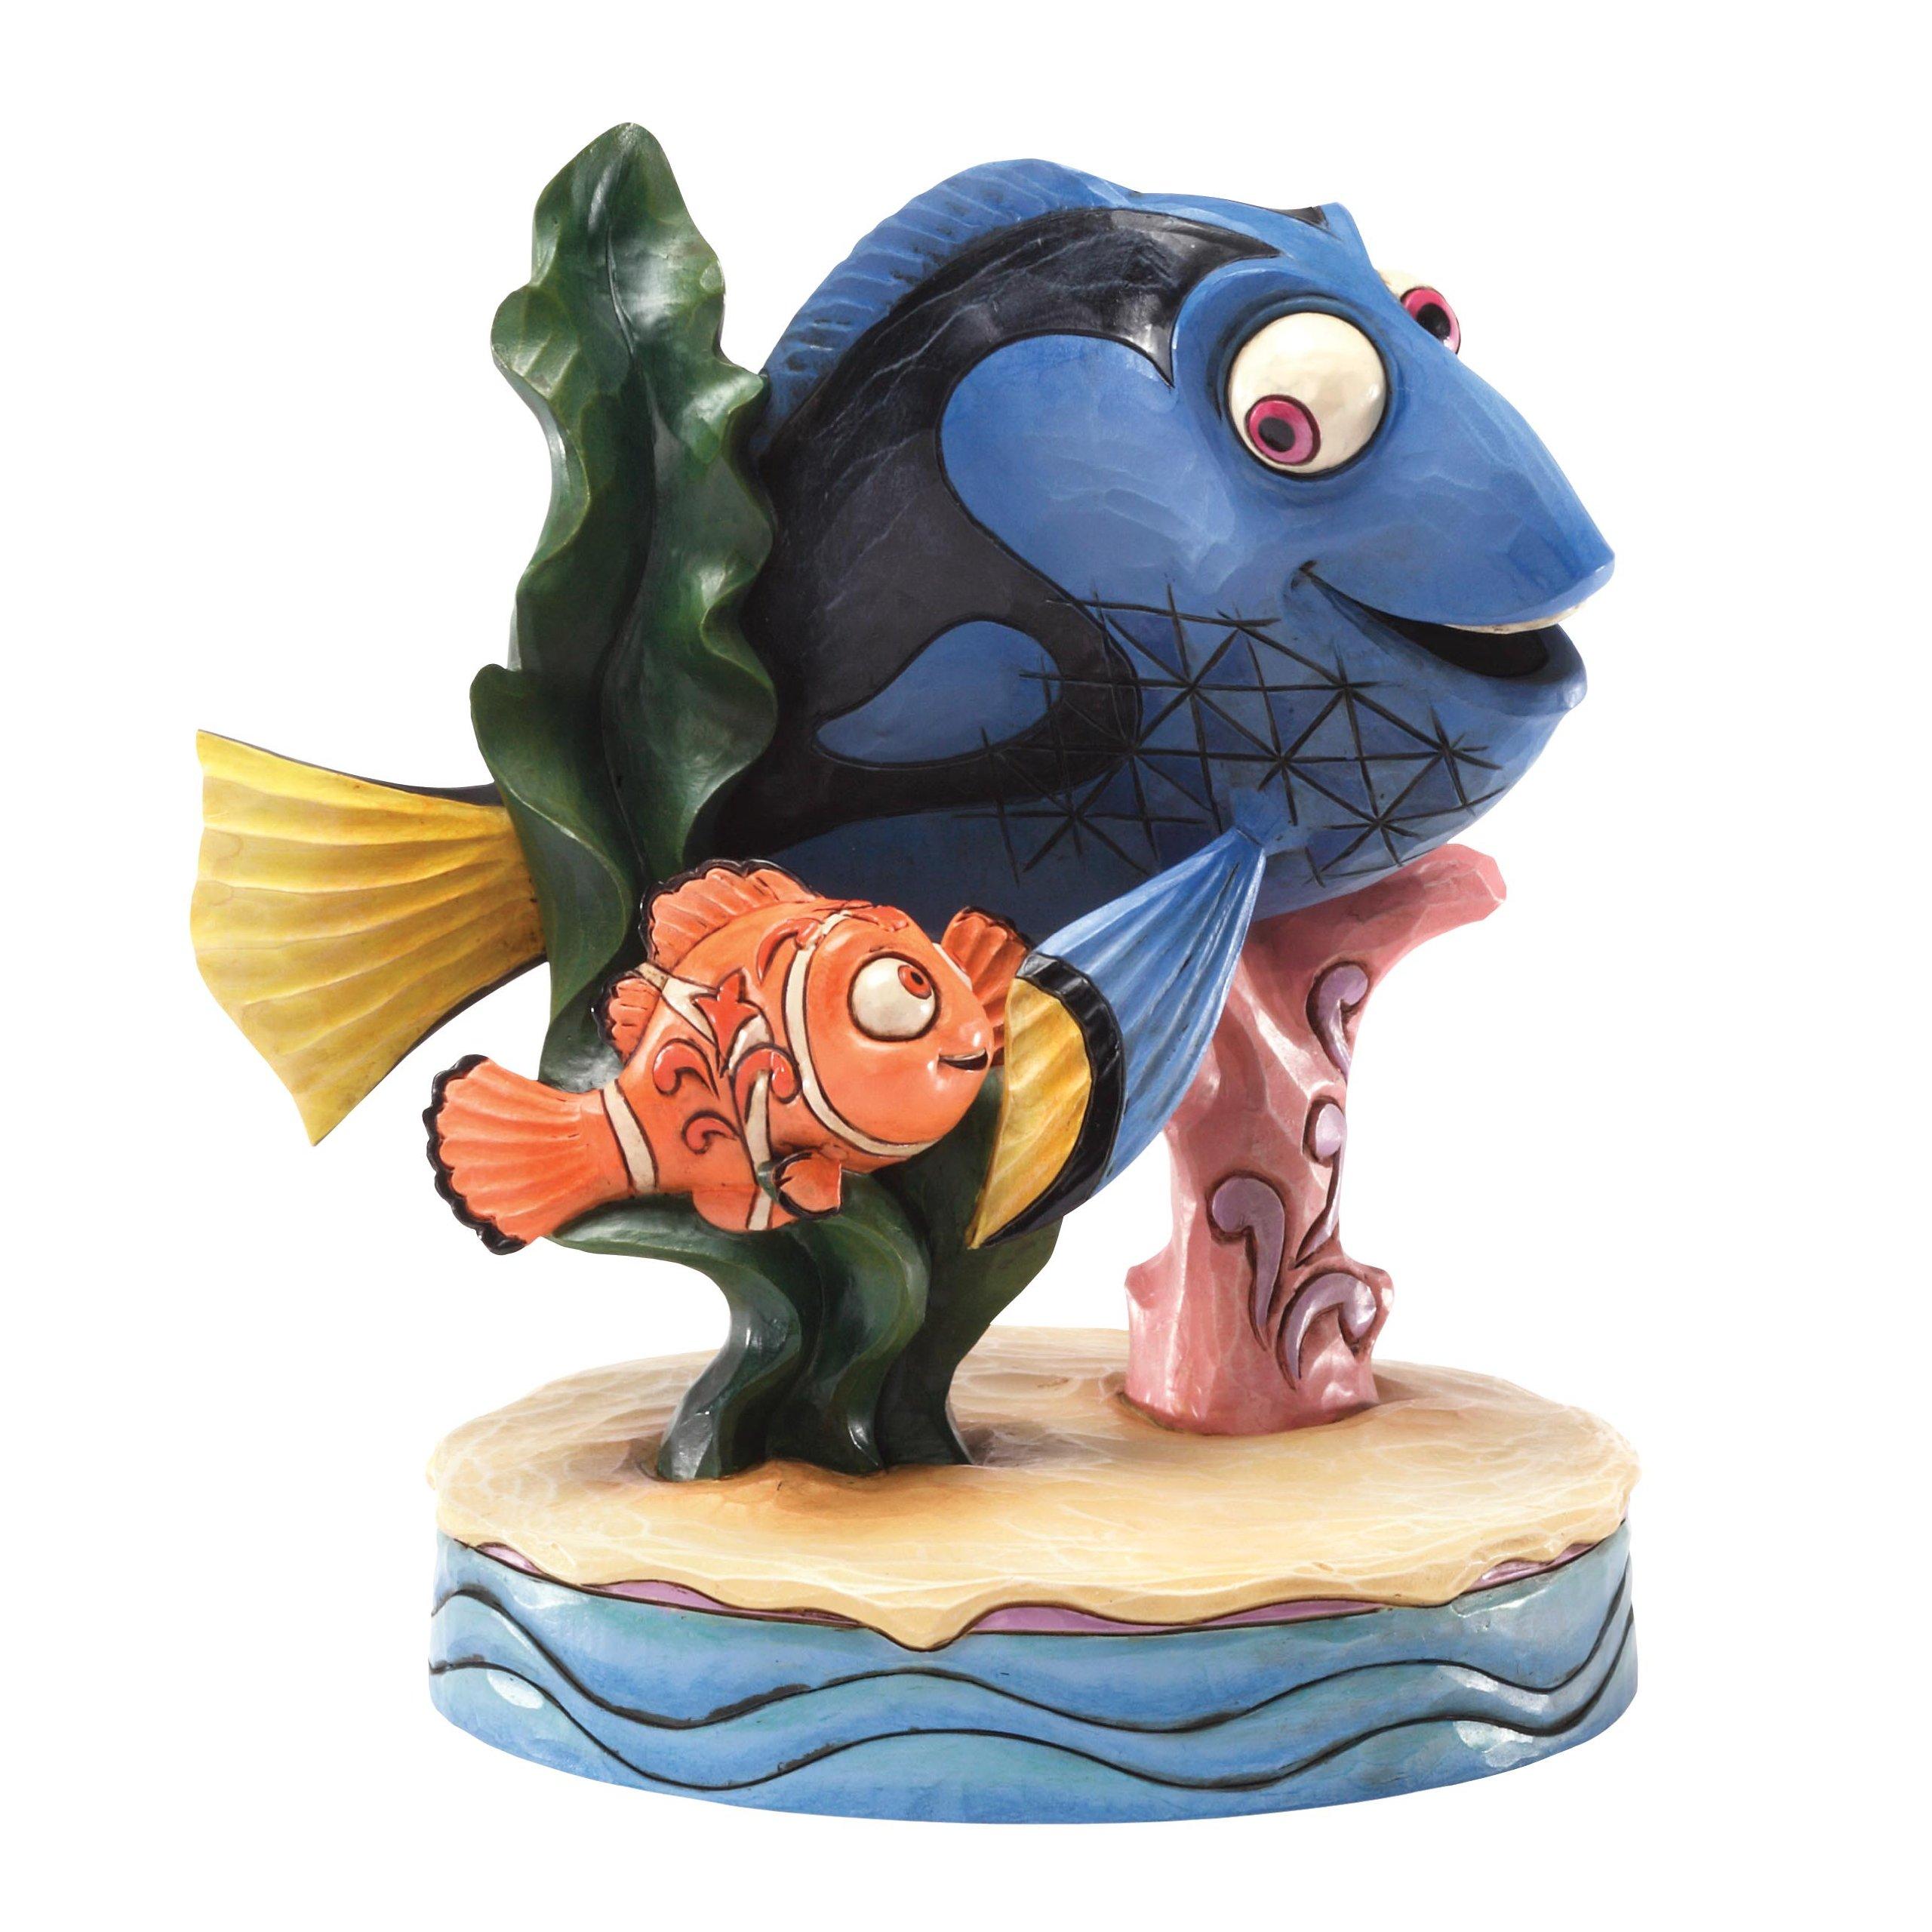 Jim Shore Disney Traditions Nemo and Dory Figurine, 5.375-Inch